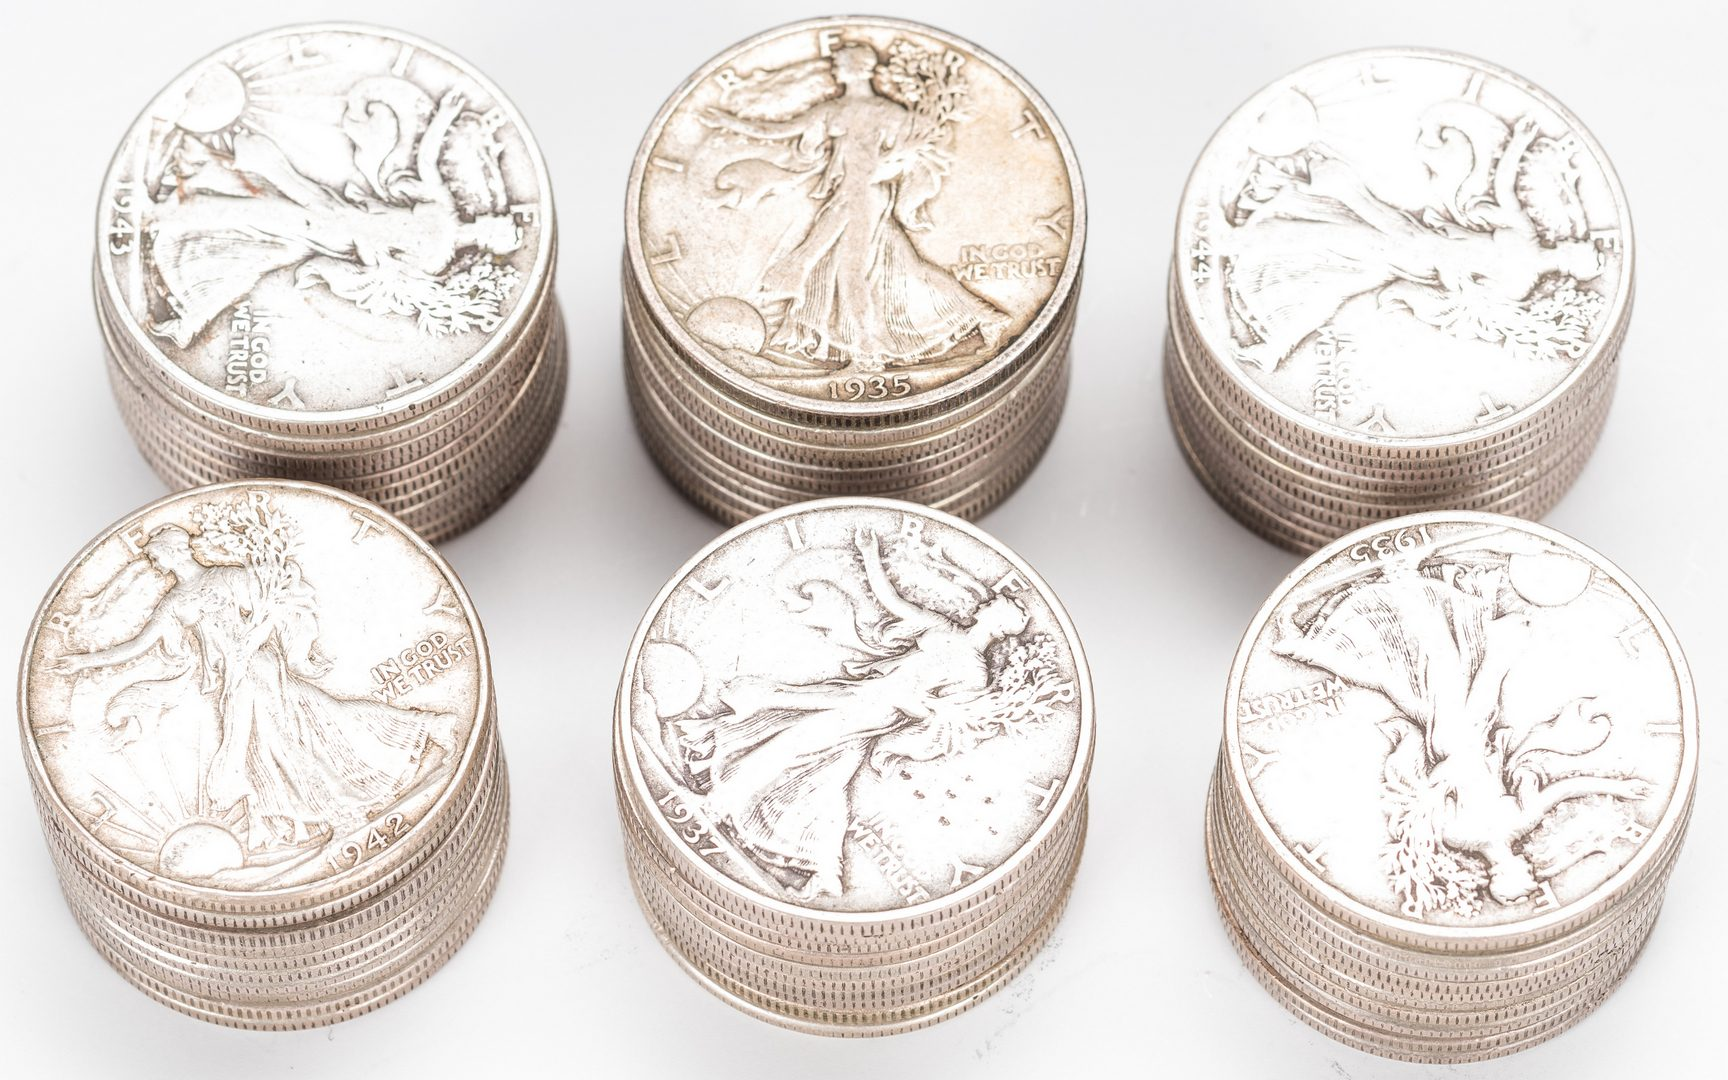 Lot 894: 68 U.S. Silver Half Dollars (1876-1947)